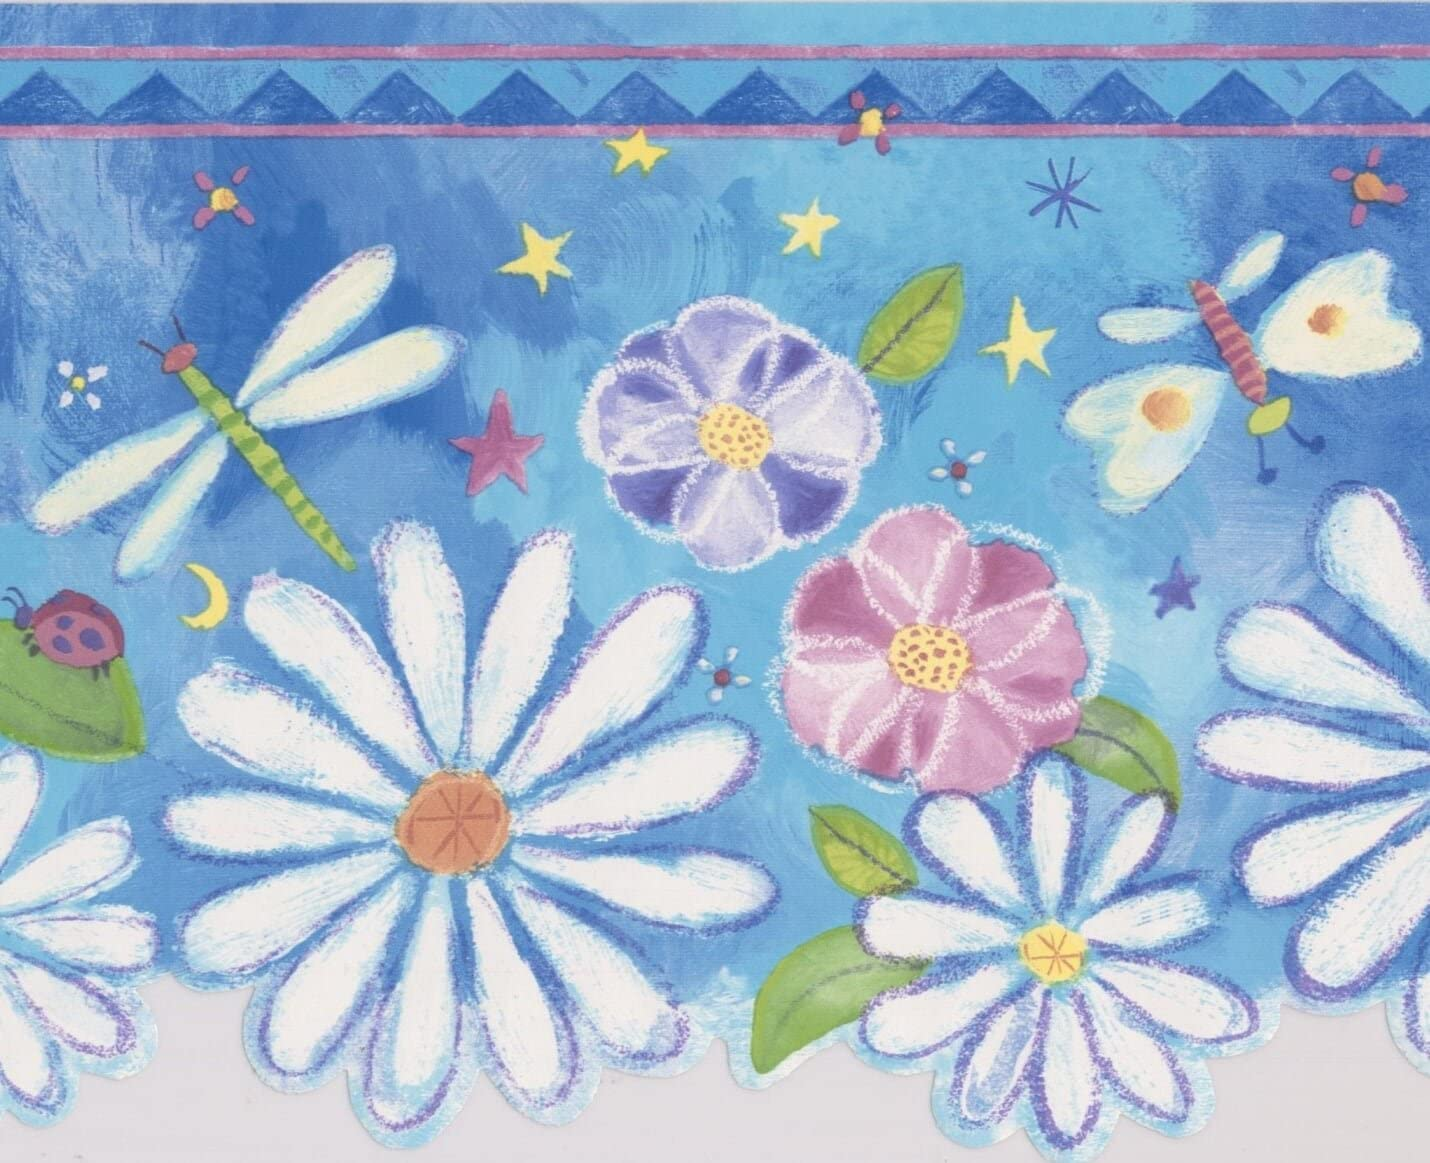 White Pink Purple Flowers Dragonfly Butterfly Stars Blue Wallpaper